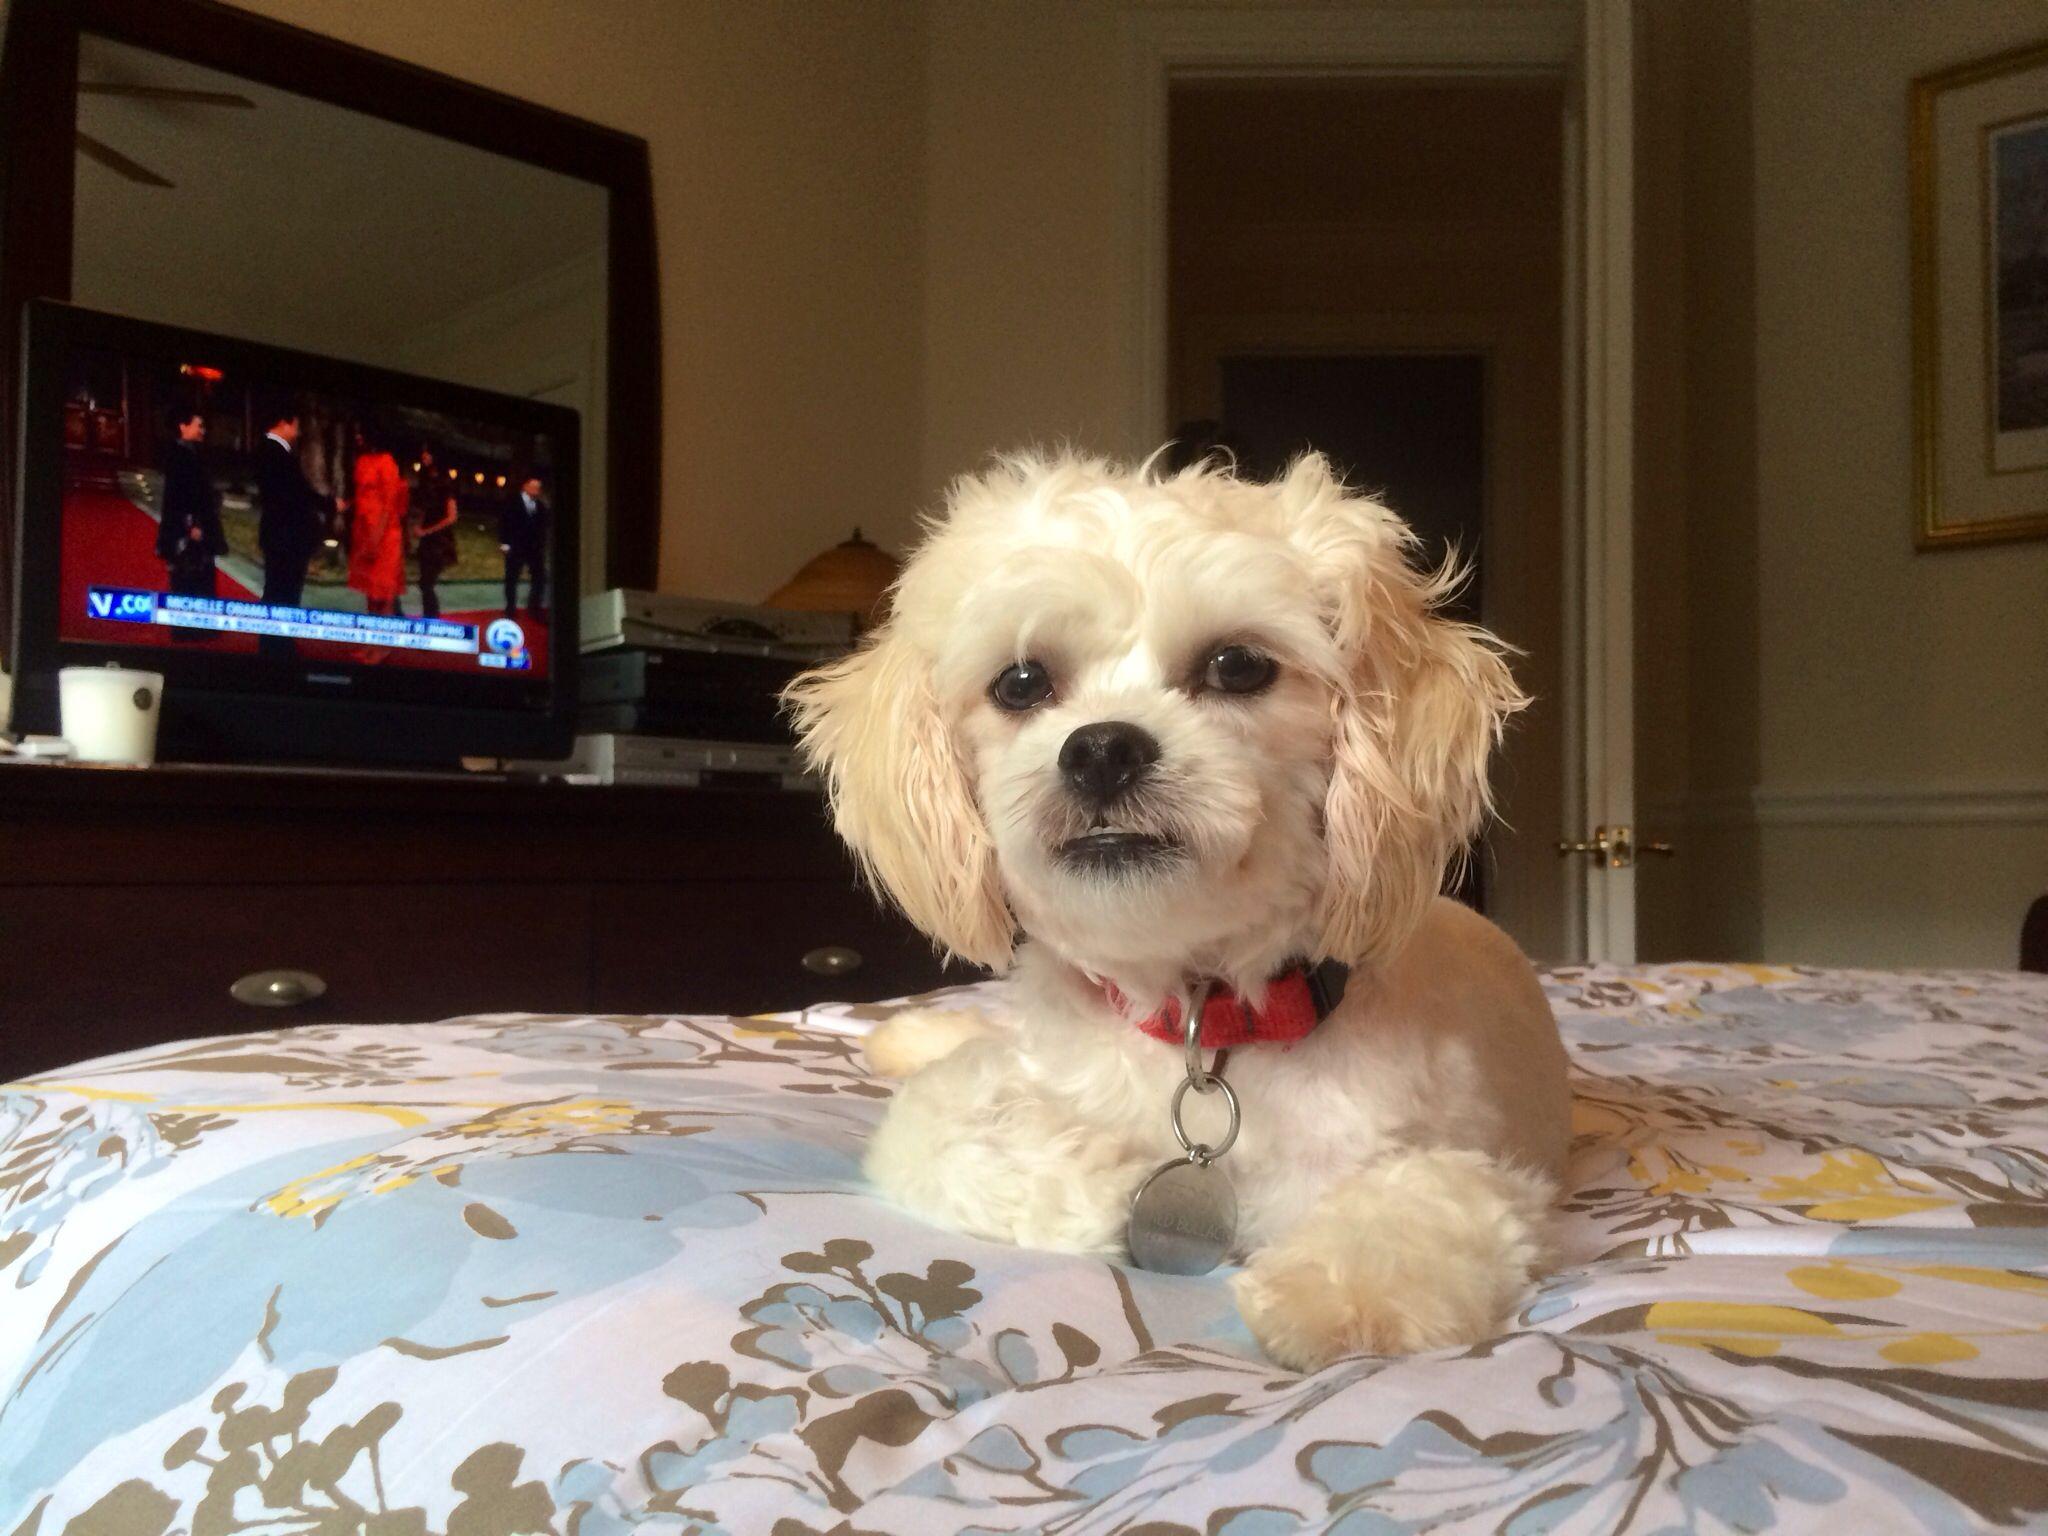 Teddy A Bichon Shih Tzu Bichon Shih Tzu Mix Companion Dog